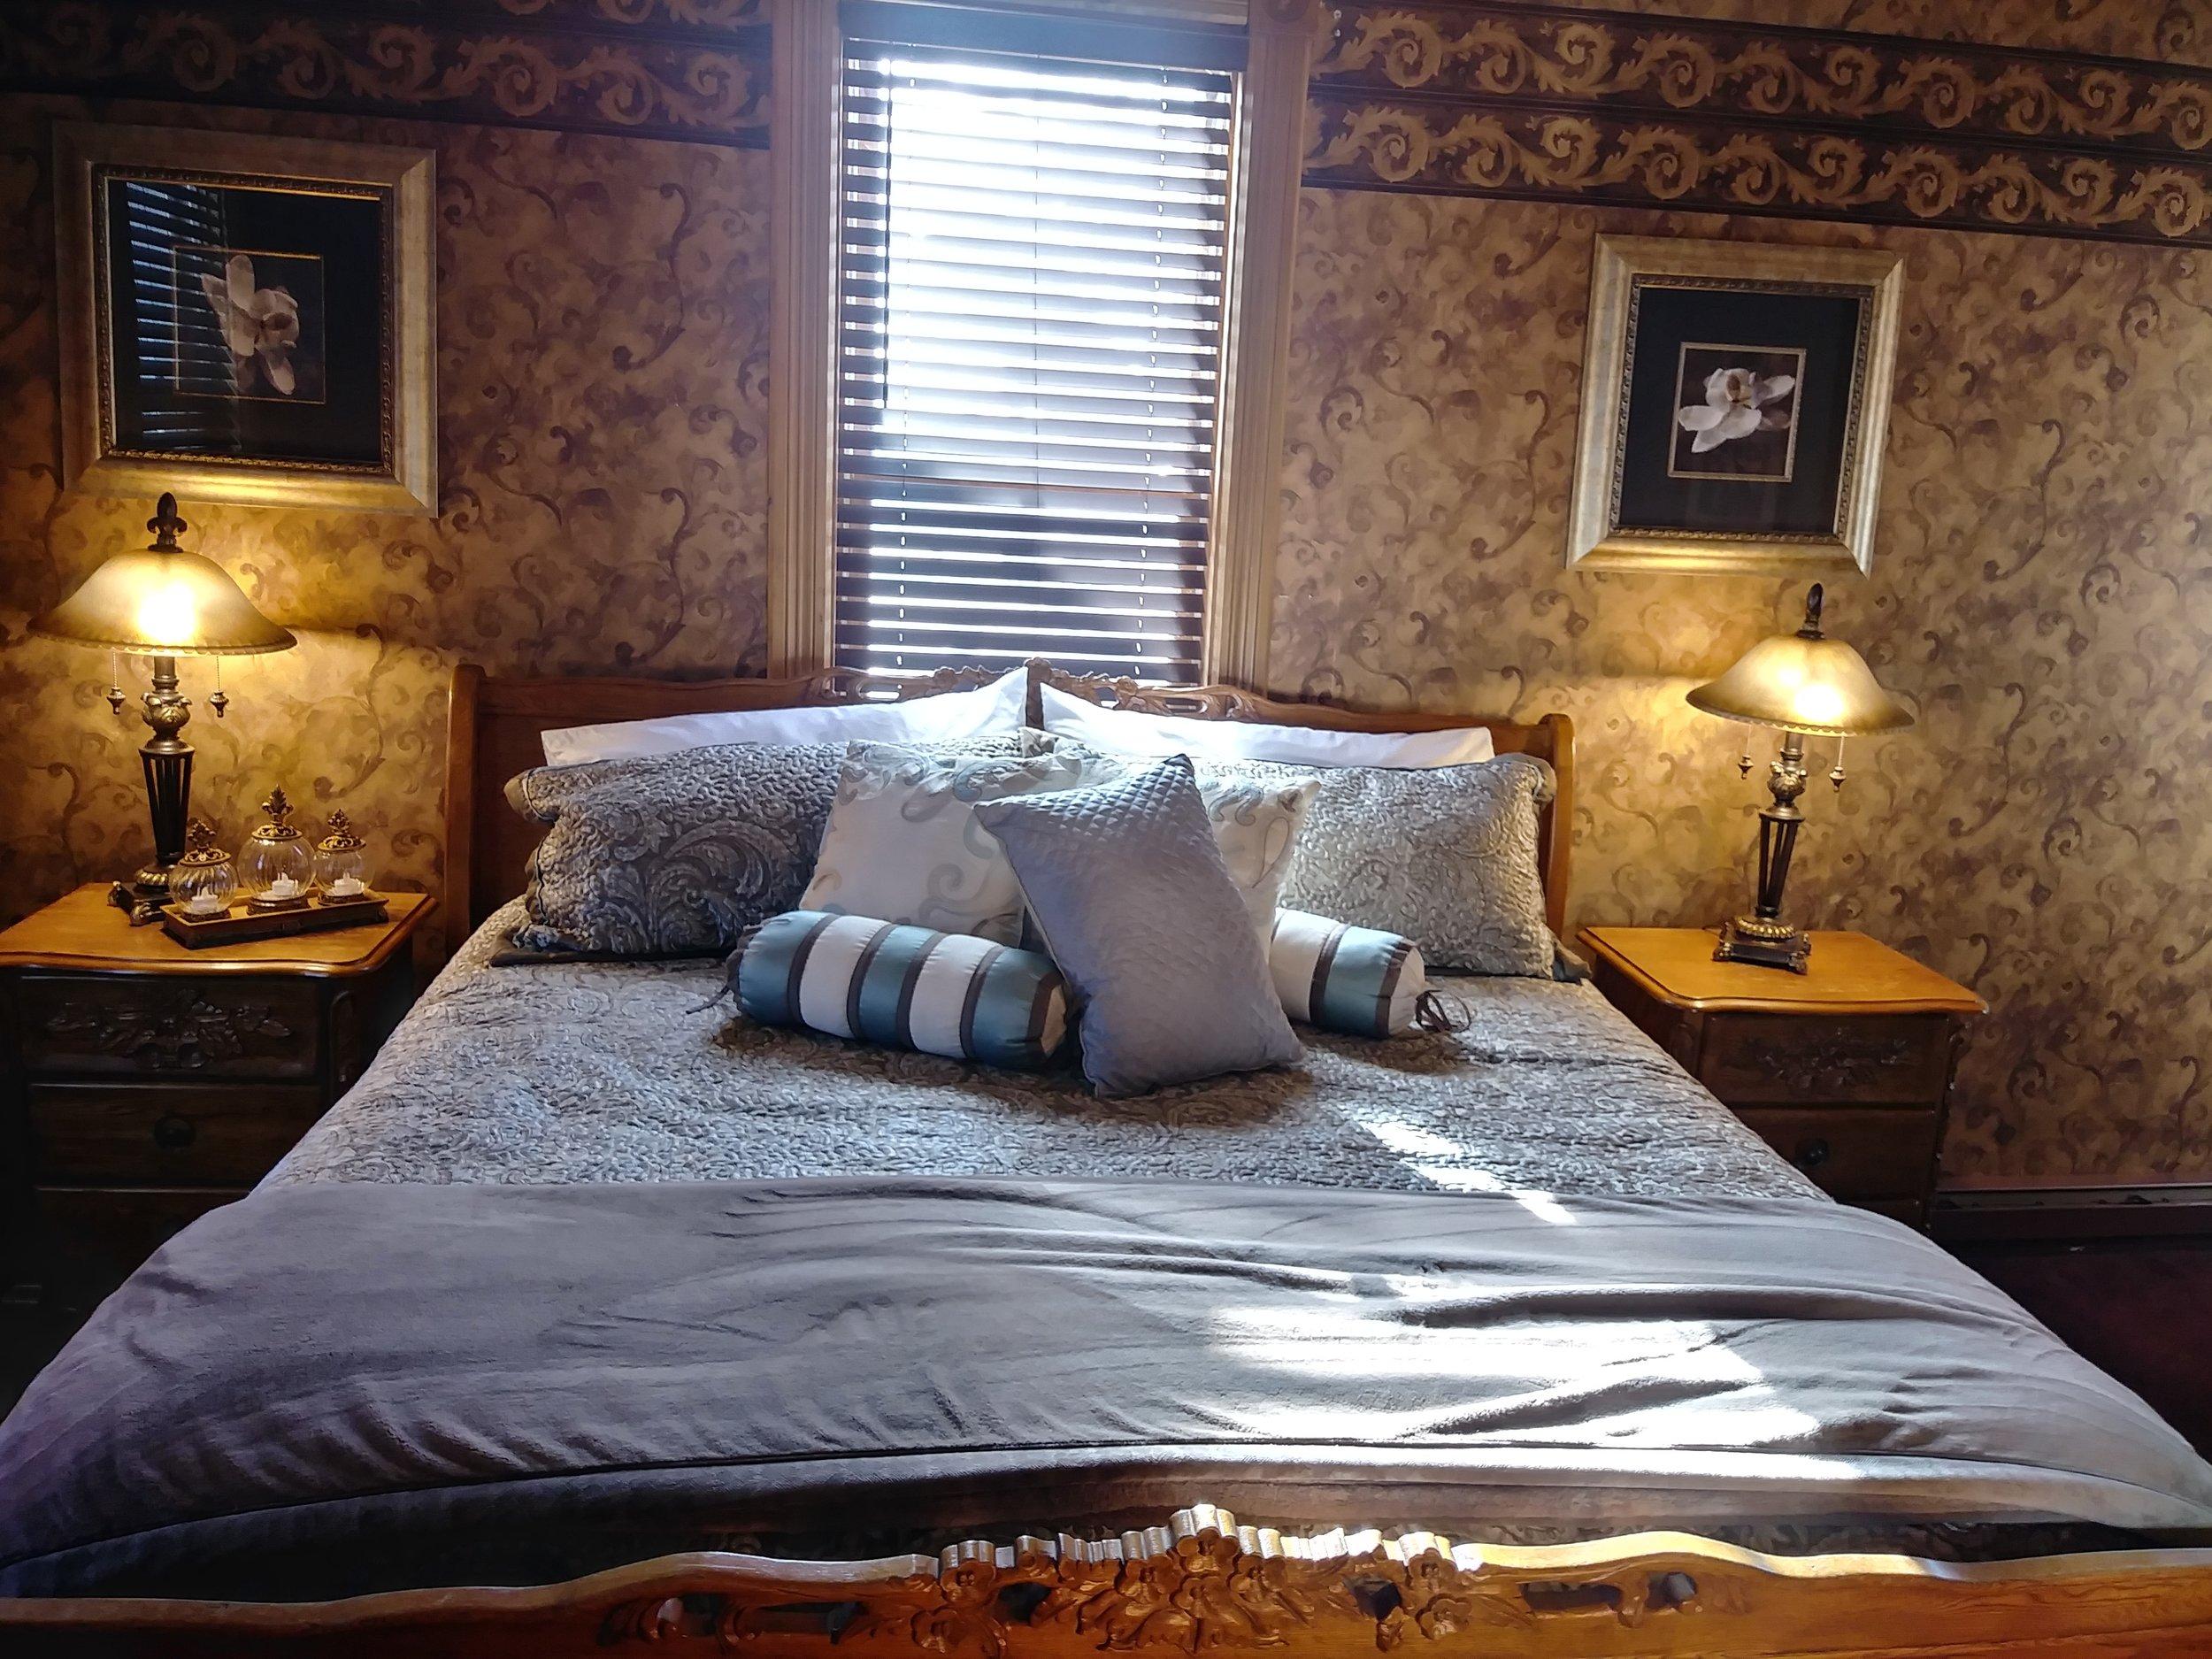 Room 201 03.jpg